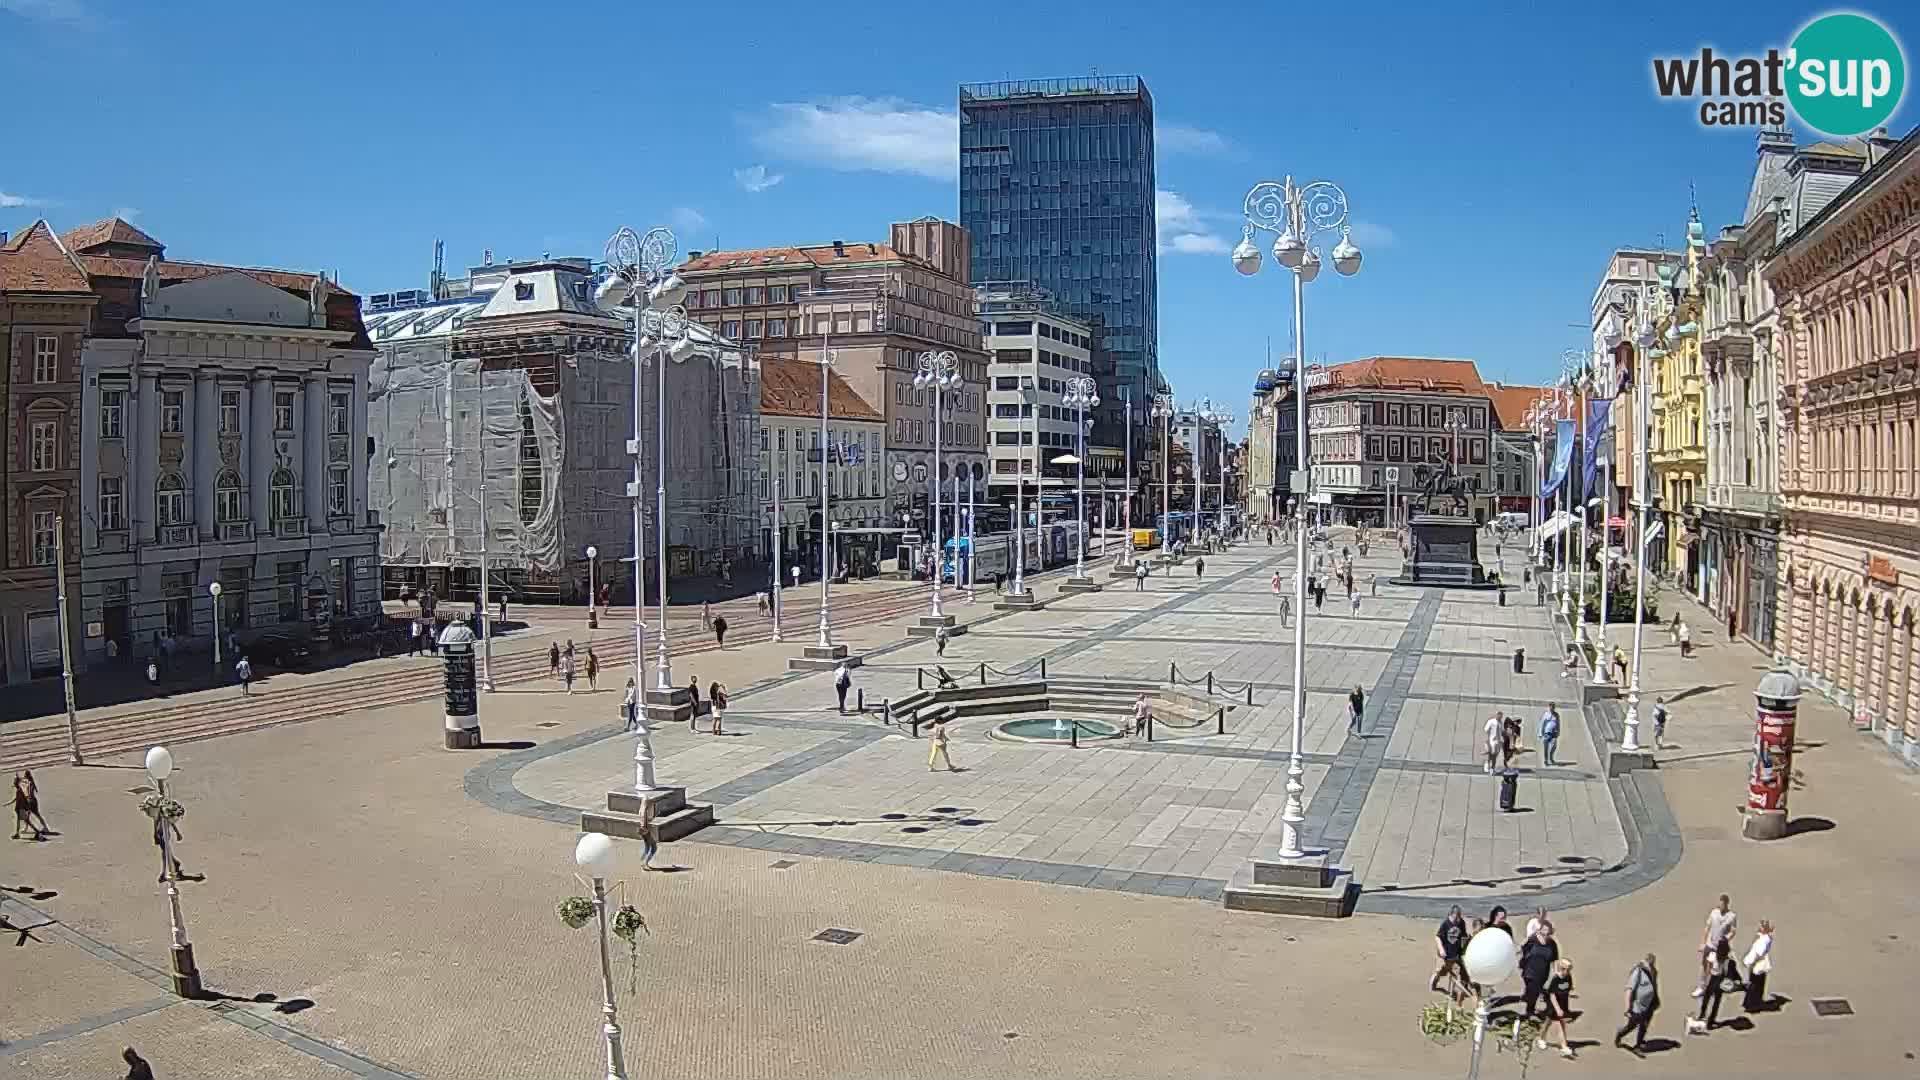 Zagreb Mon. 12:36